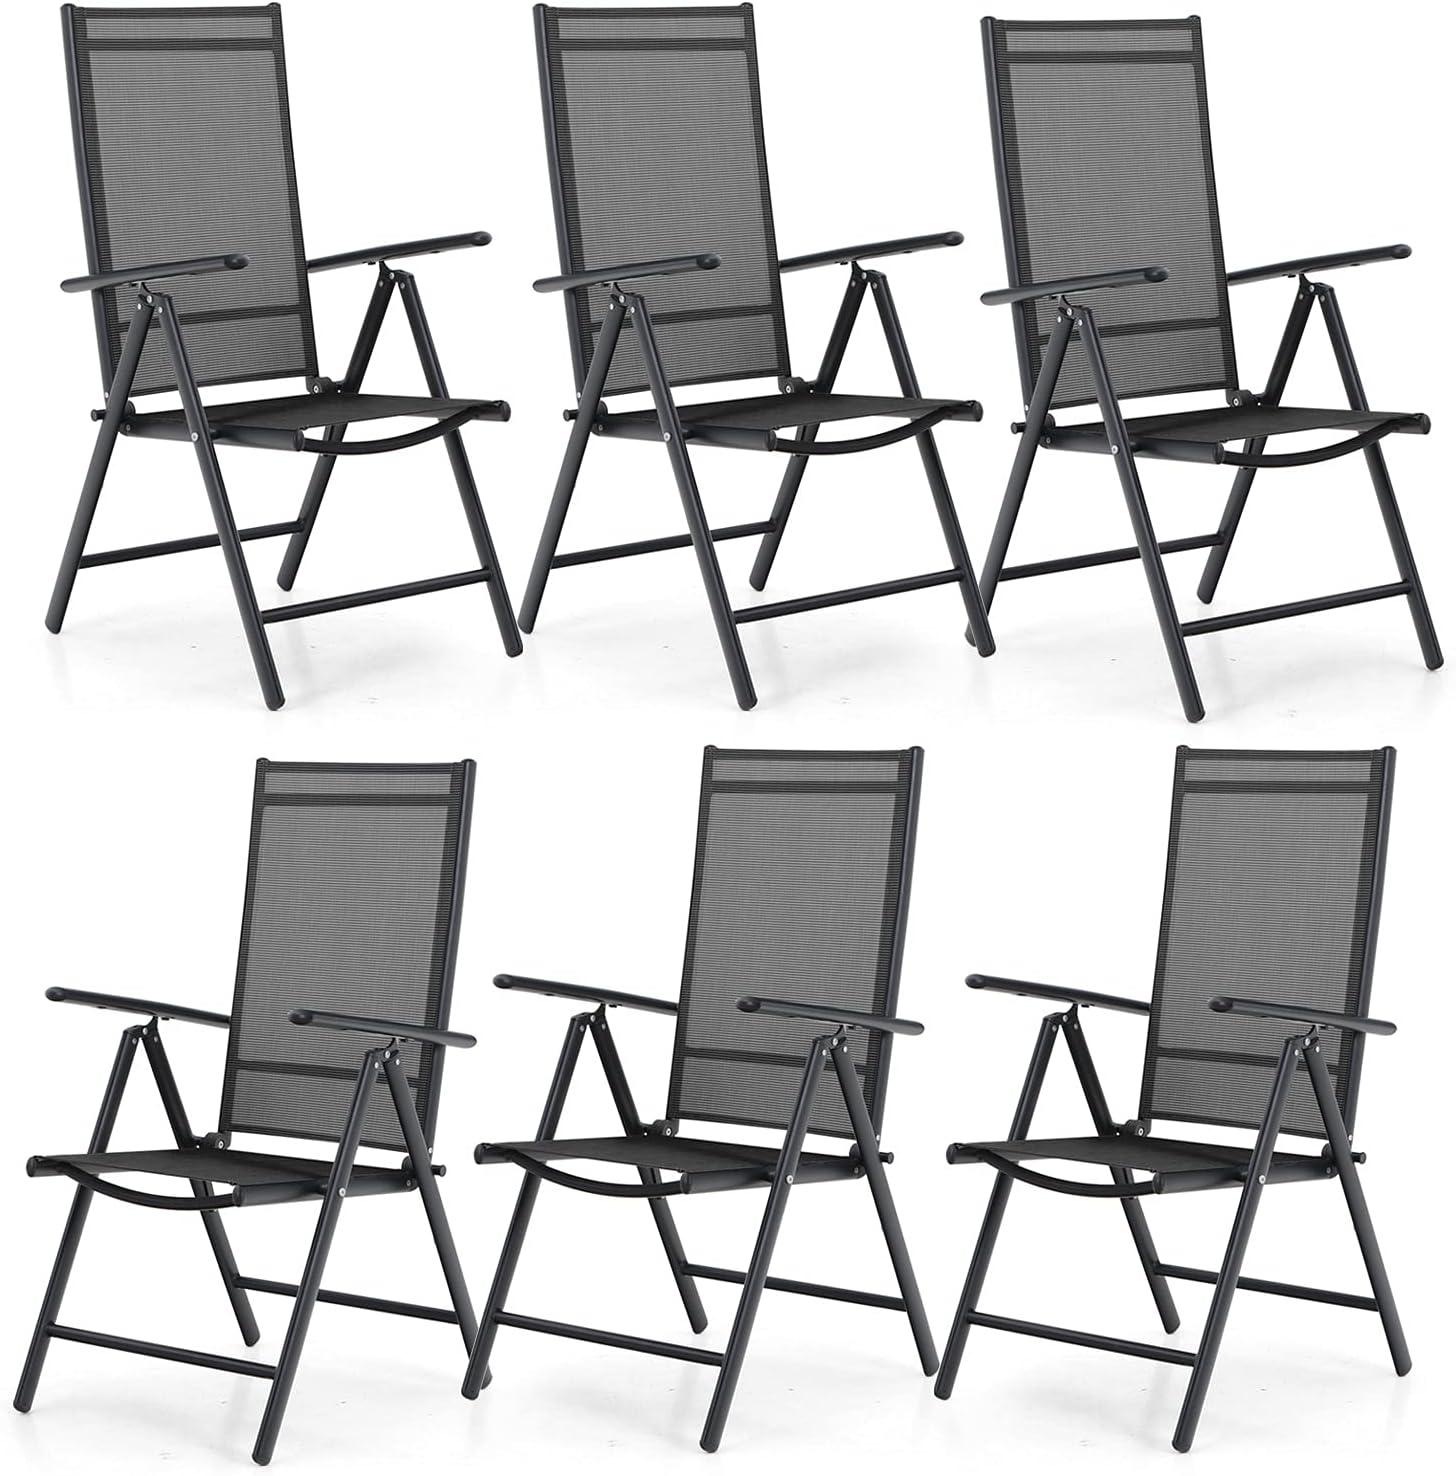 PHI VILLA Patio Import Folding Chairs Set Rec Bombing free shipping Adjustable Portable 6 of